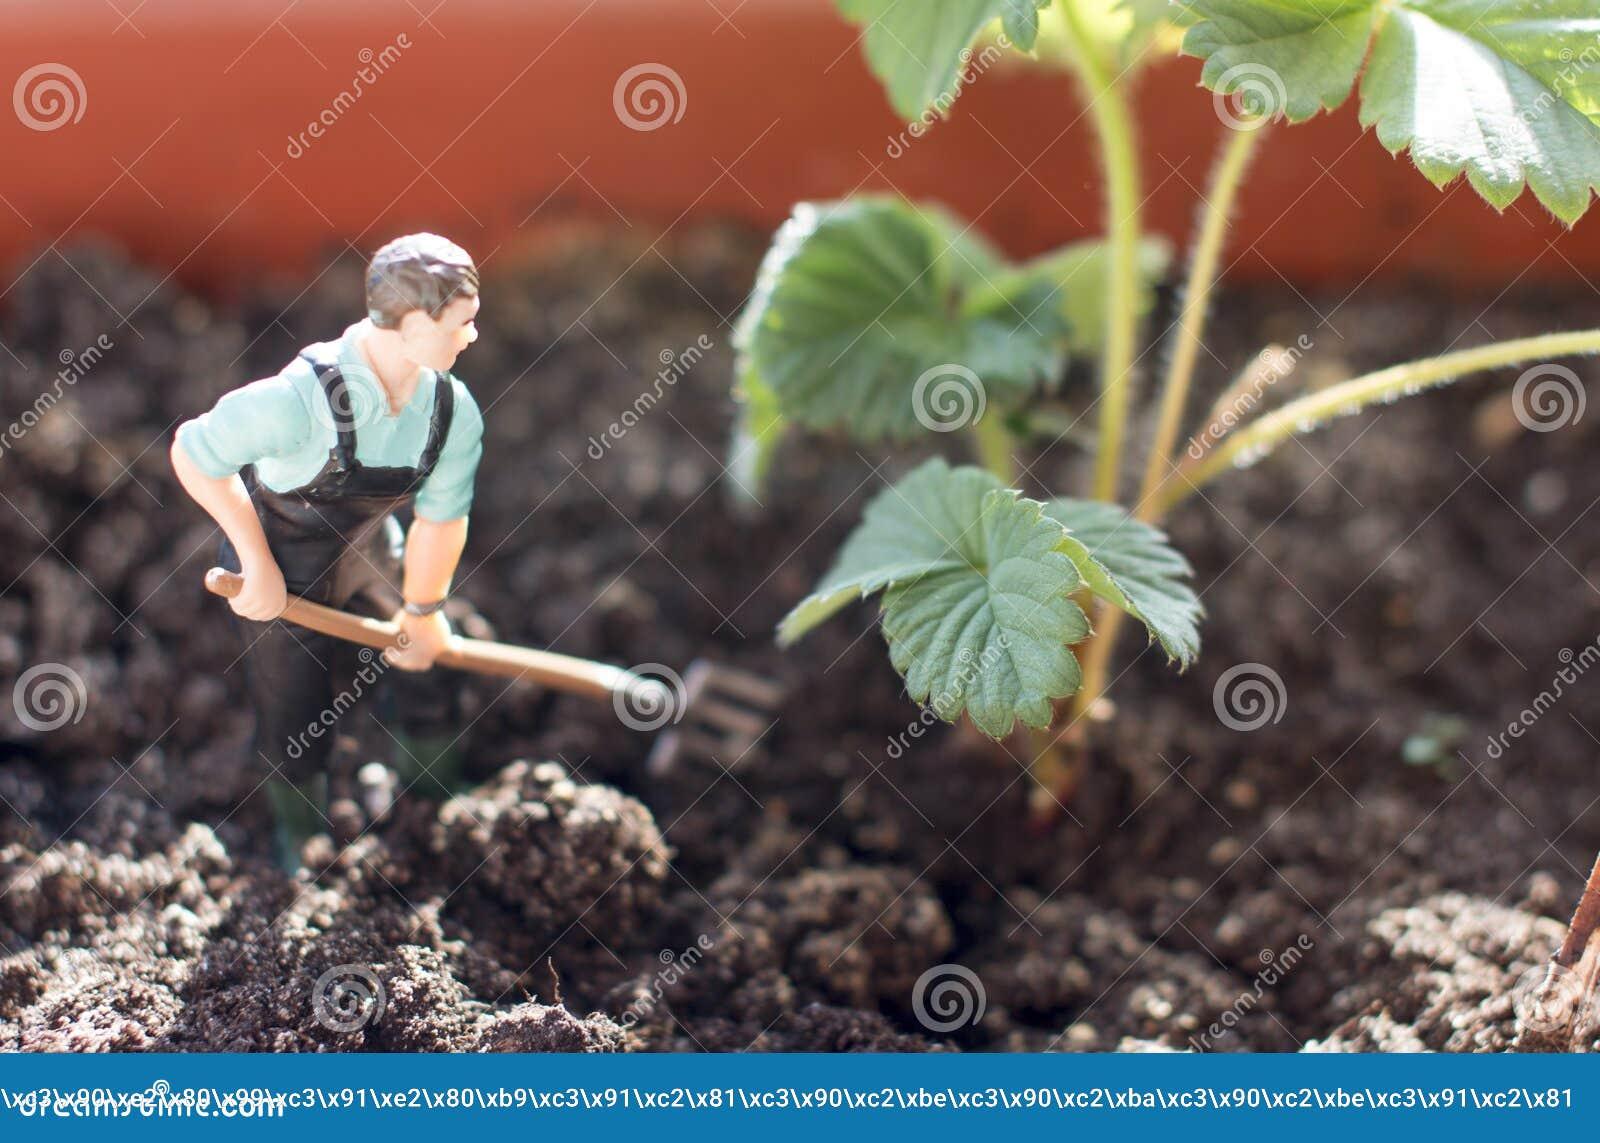 Cosechas jovenes del granjero